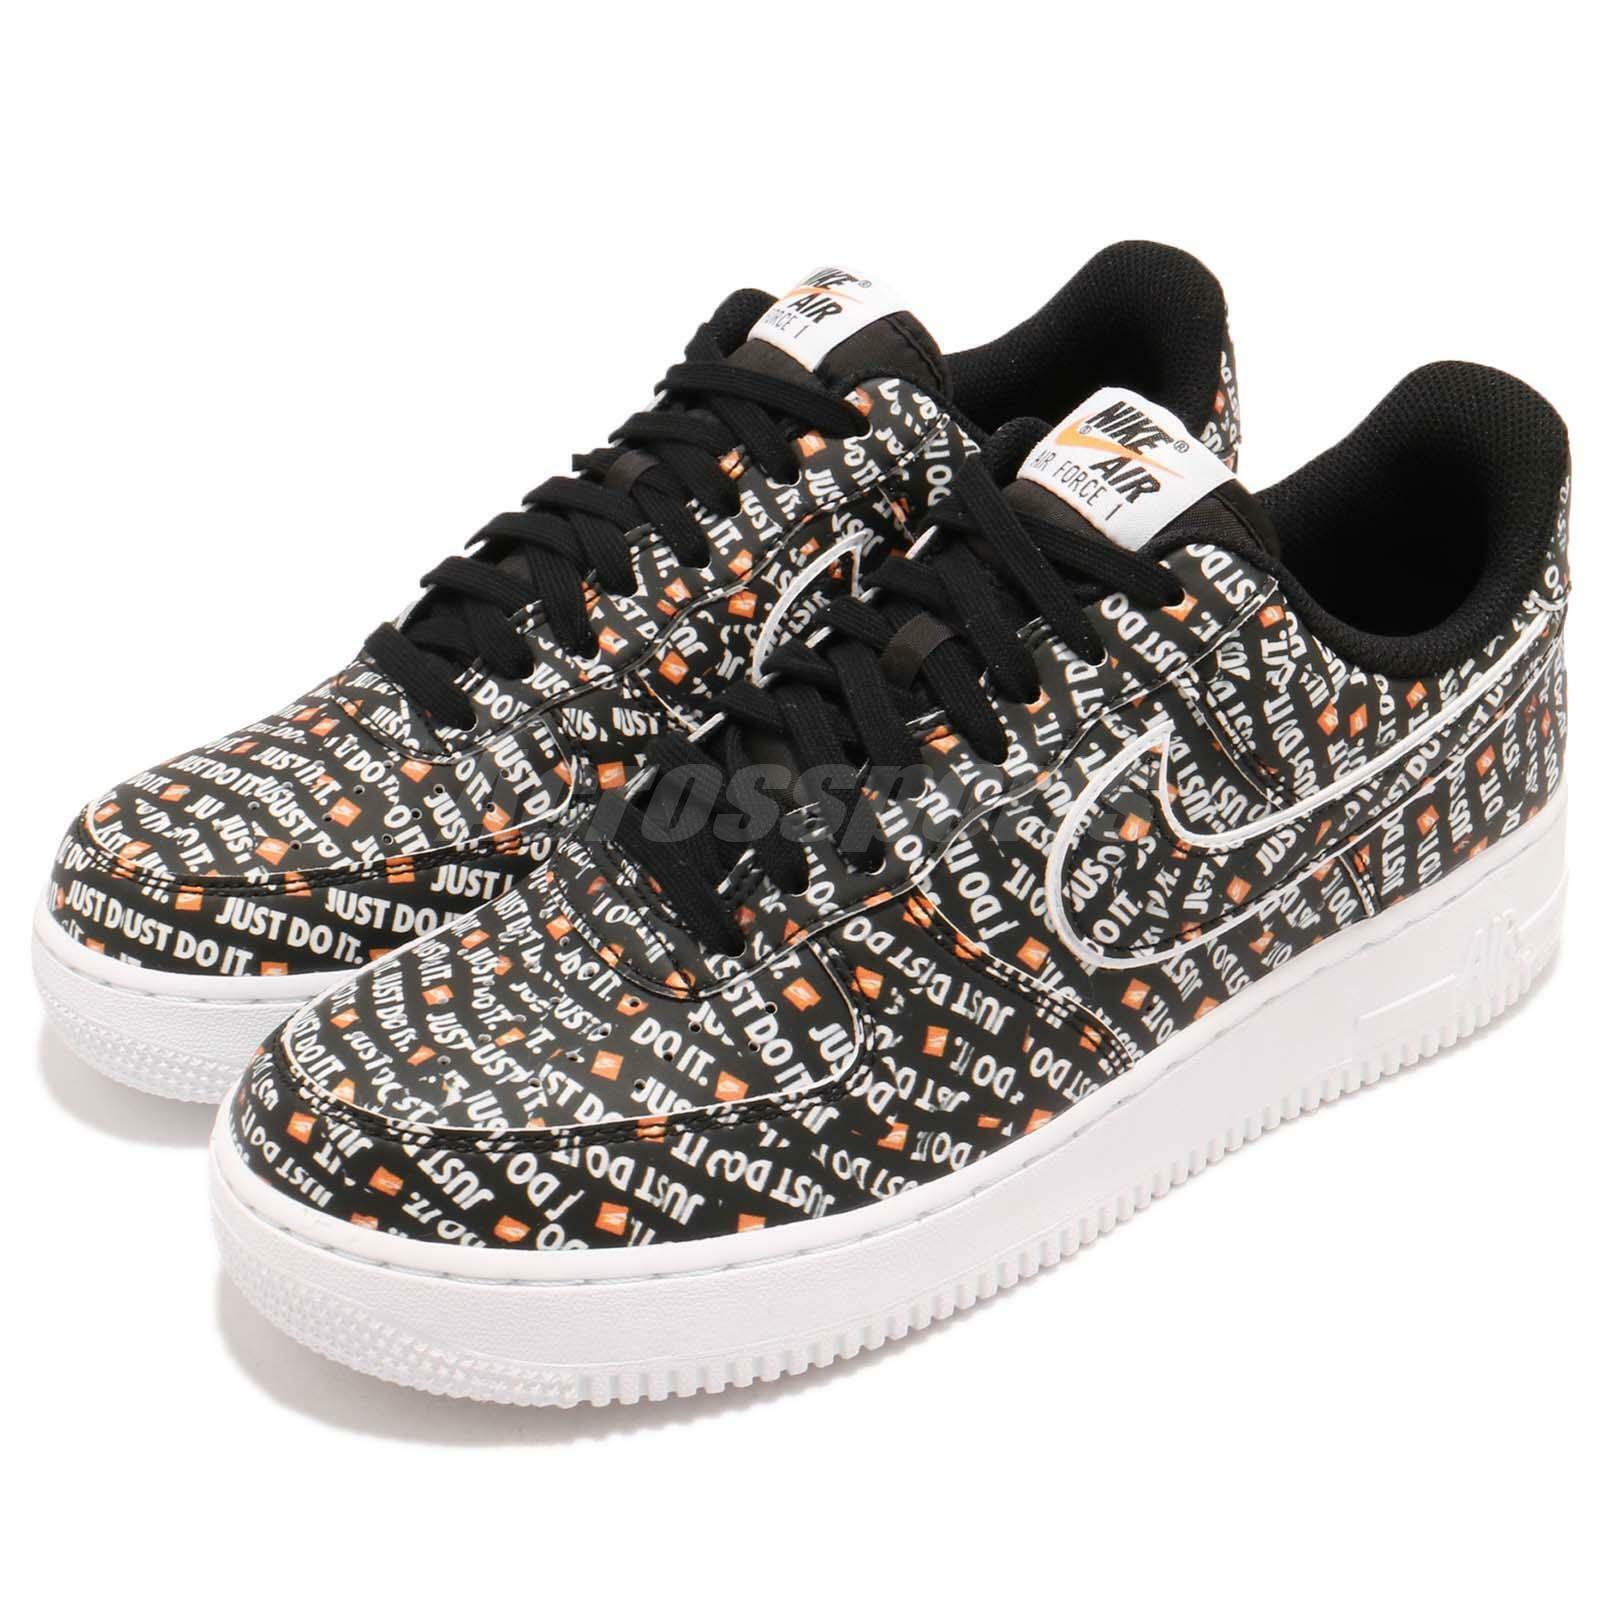 Mens Nike Air Relentless 6 SNEAKERS Black 843836-001 Many Sizes 8